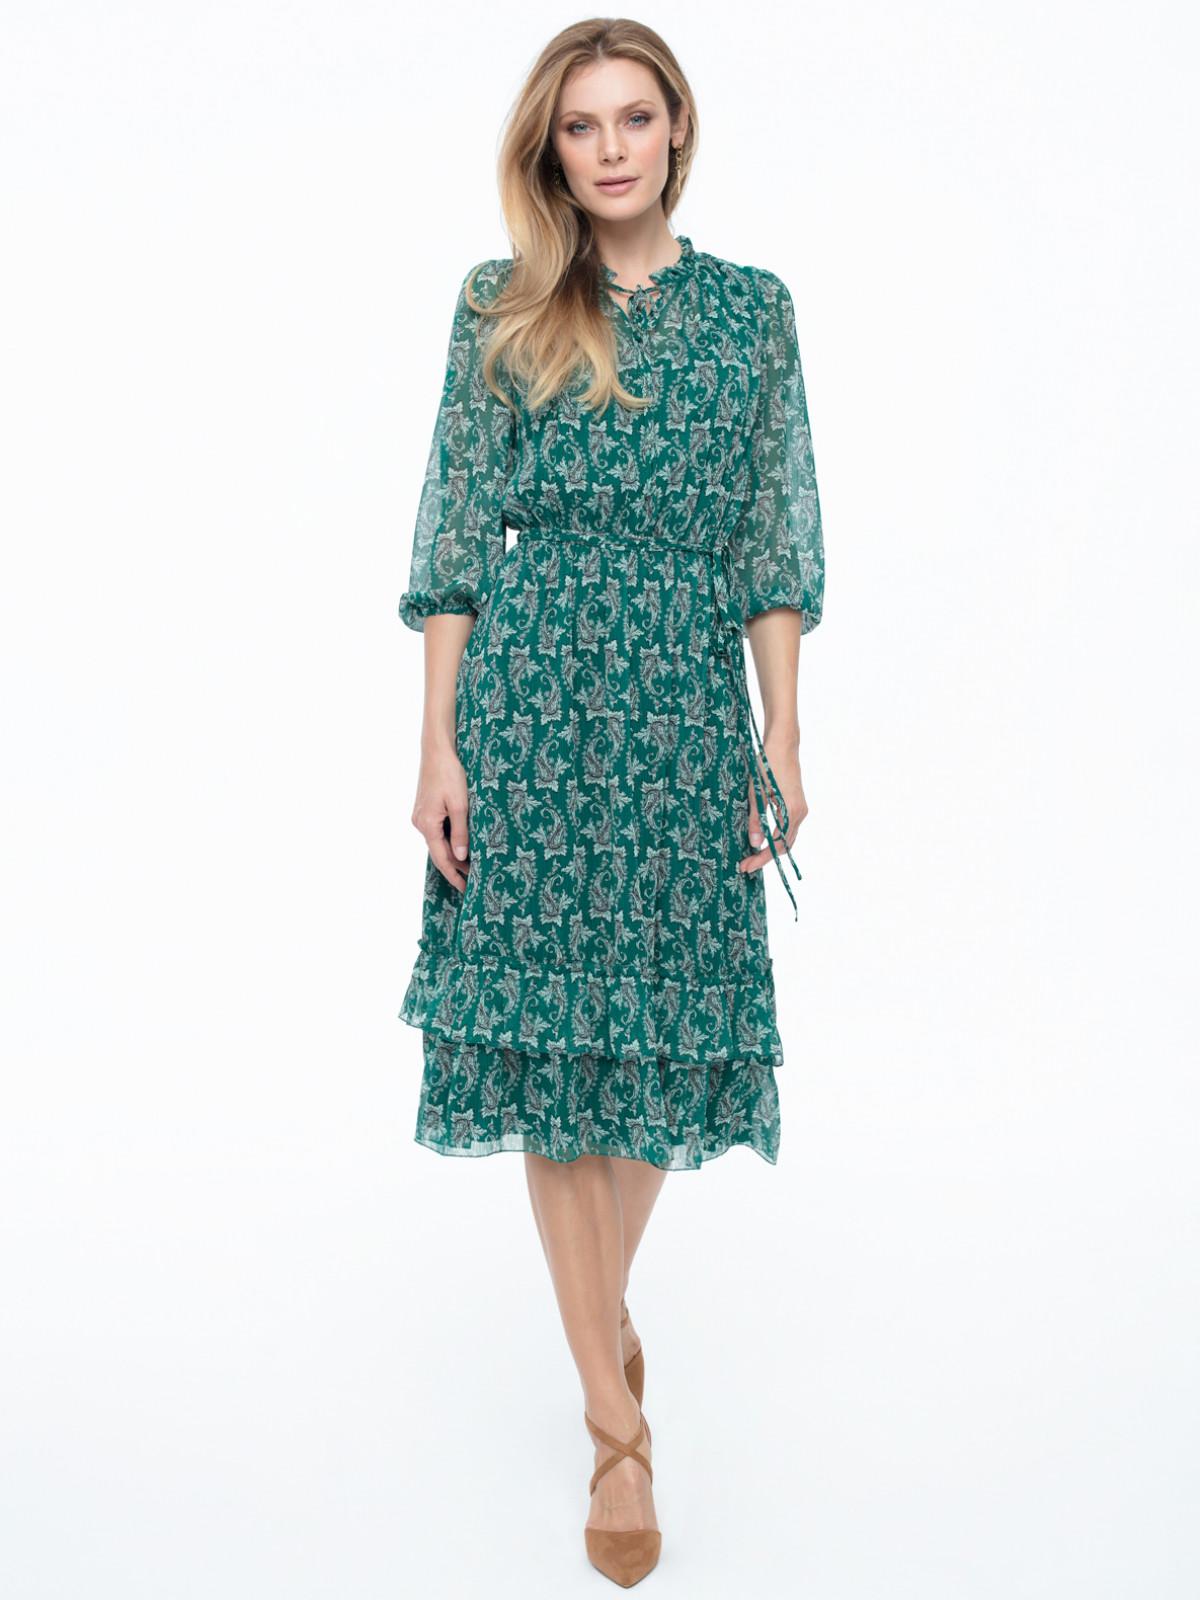 Zielona wzorzysta sukienka Potis & Verso Luiza